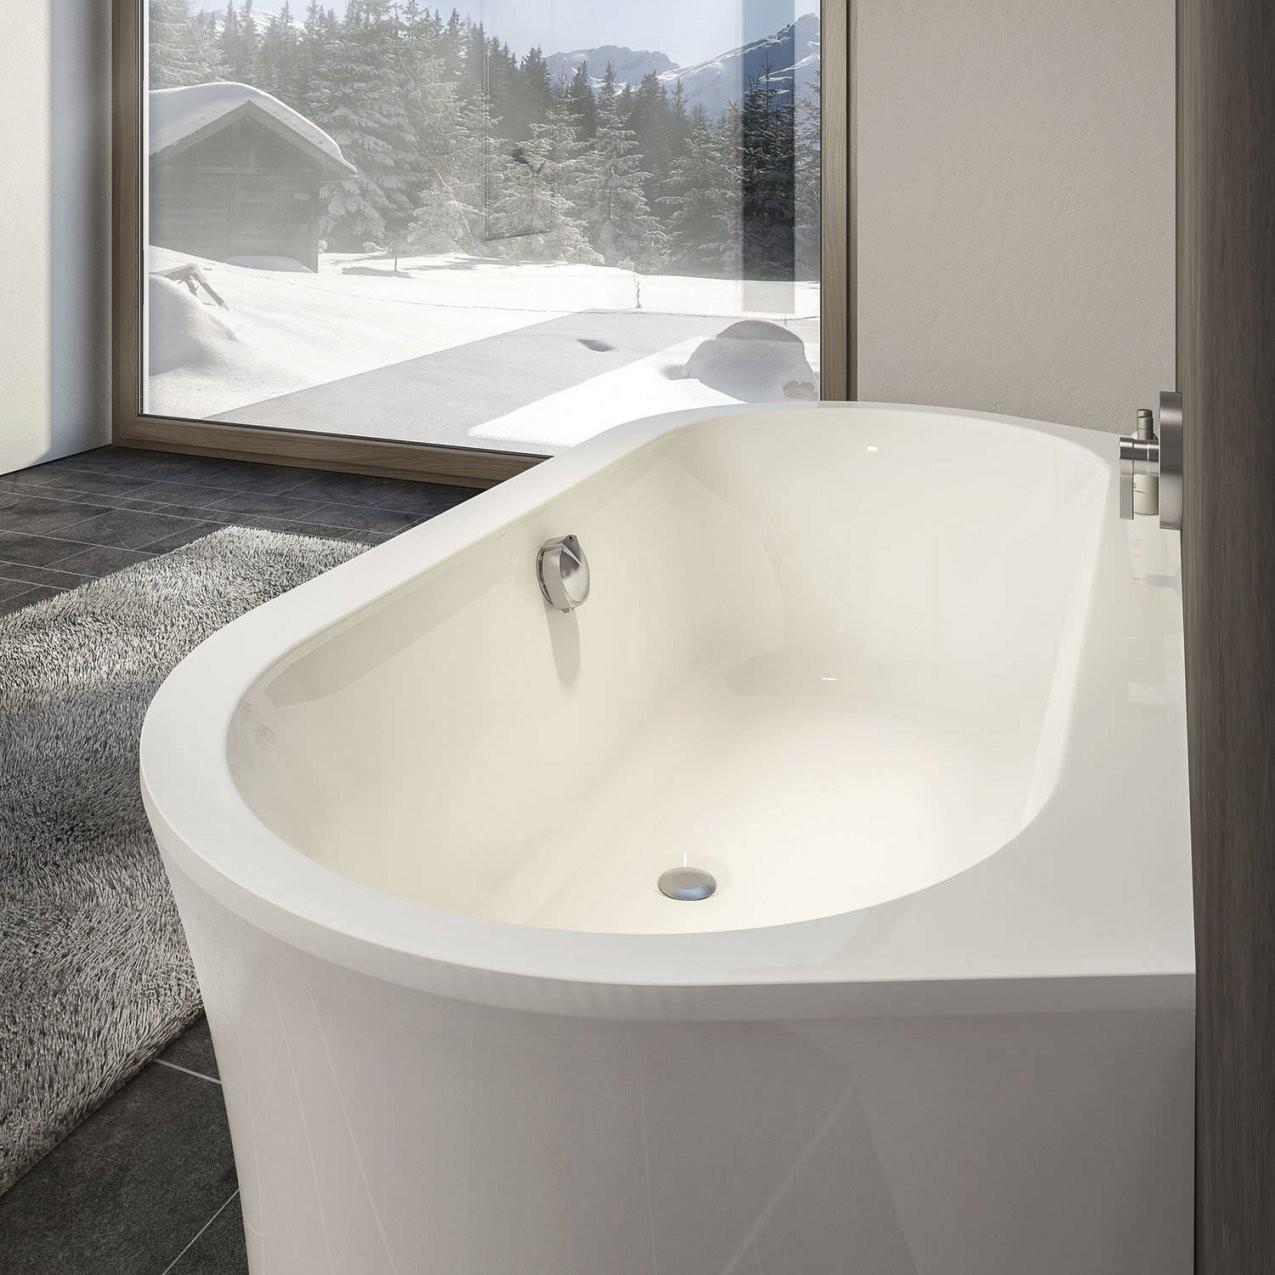 Freistehende Badewanne  Oval  Aus Acryl  Primeline Wall von Ovale Freistehende Badewanne Bild